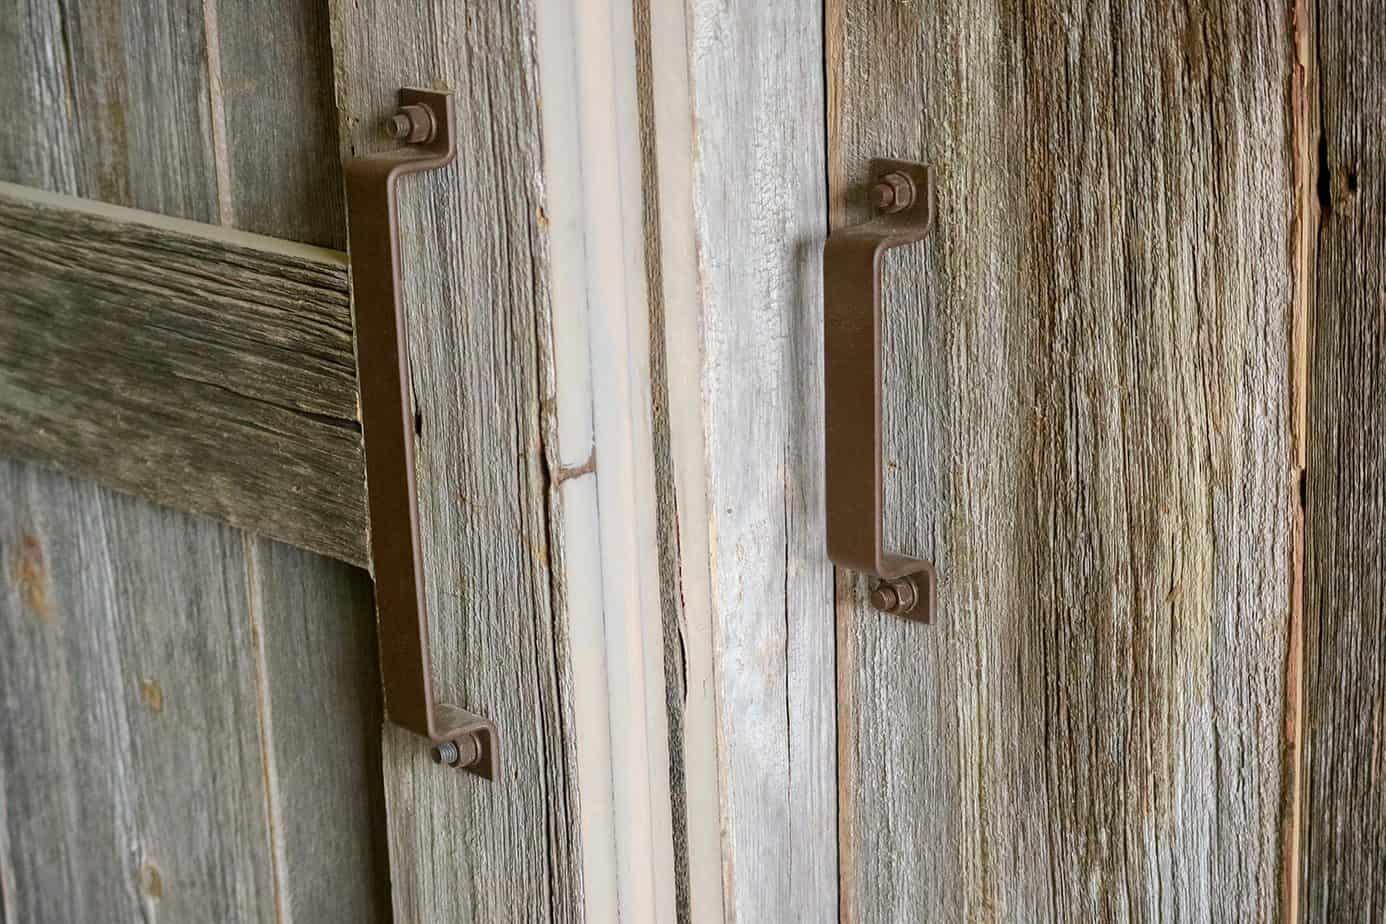 rust brown colored sliding barn door pull handles